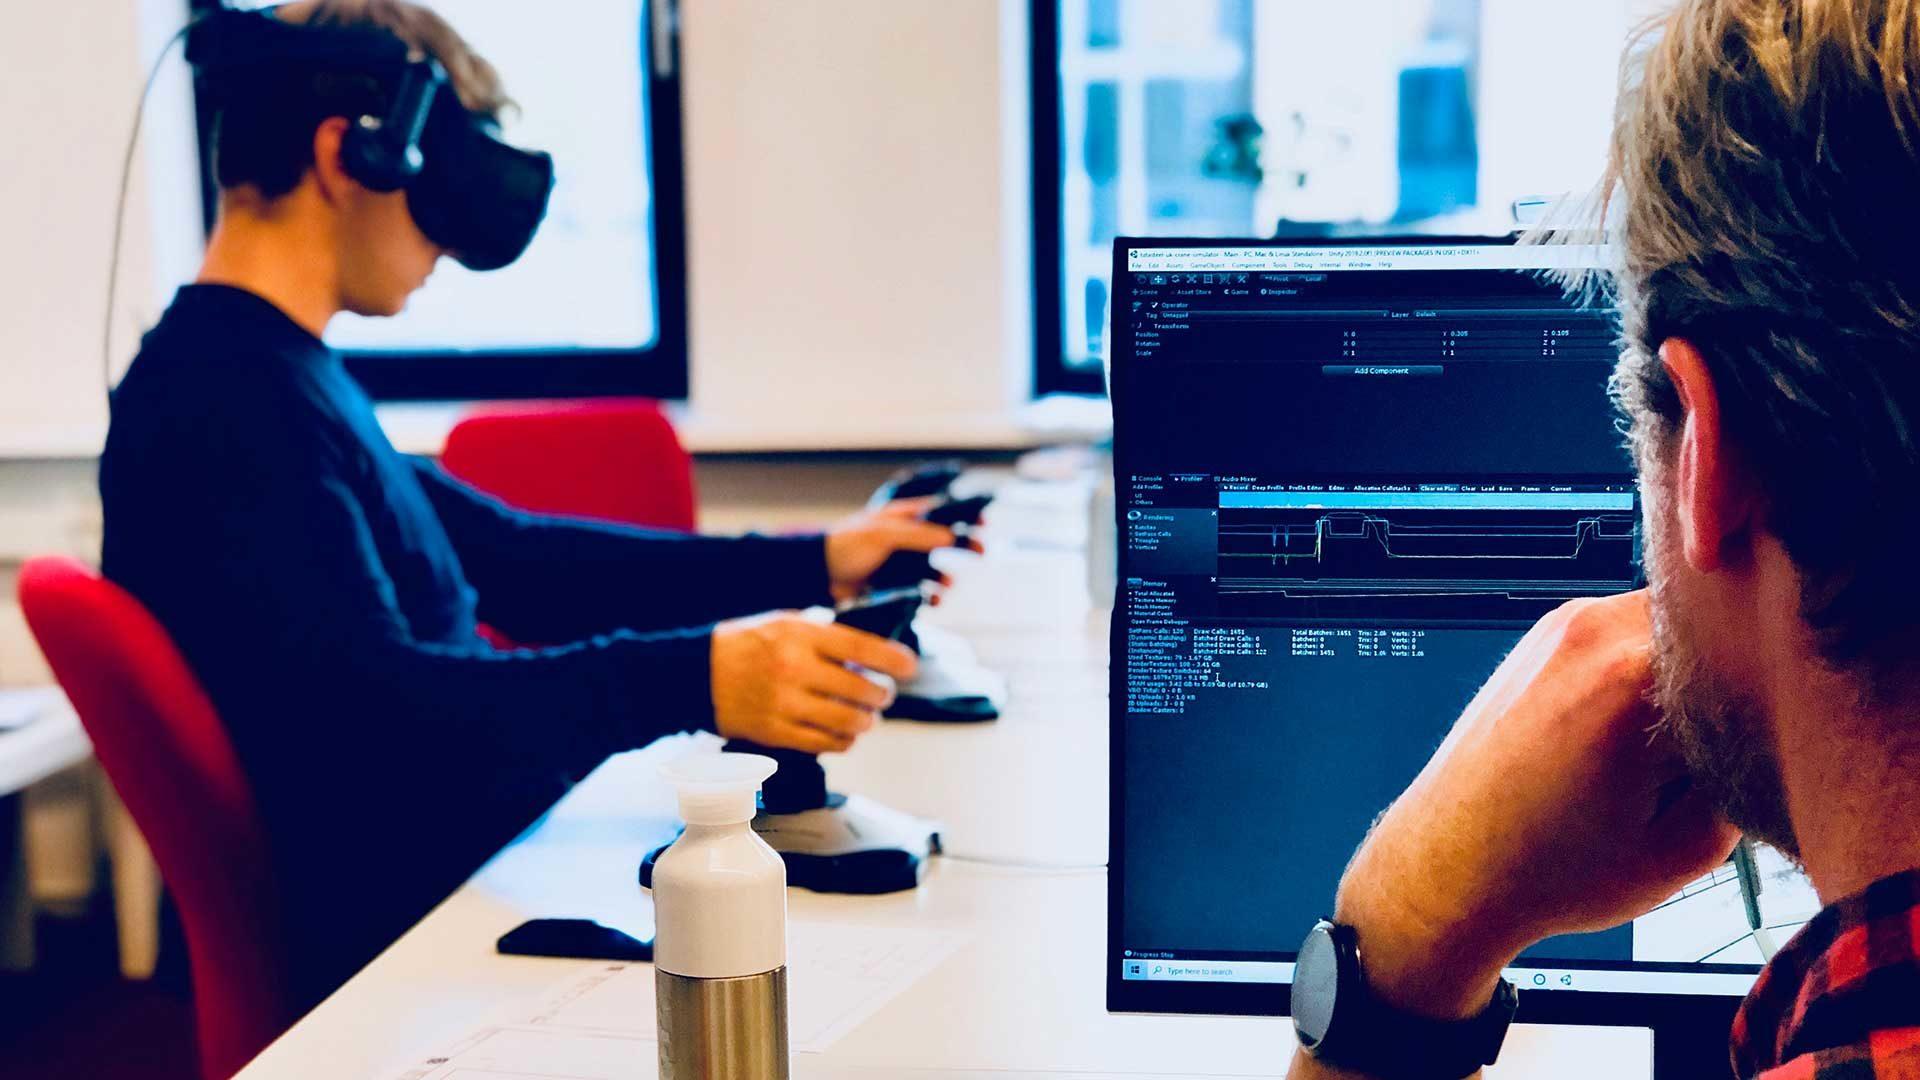 VR crane simulator